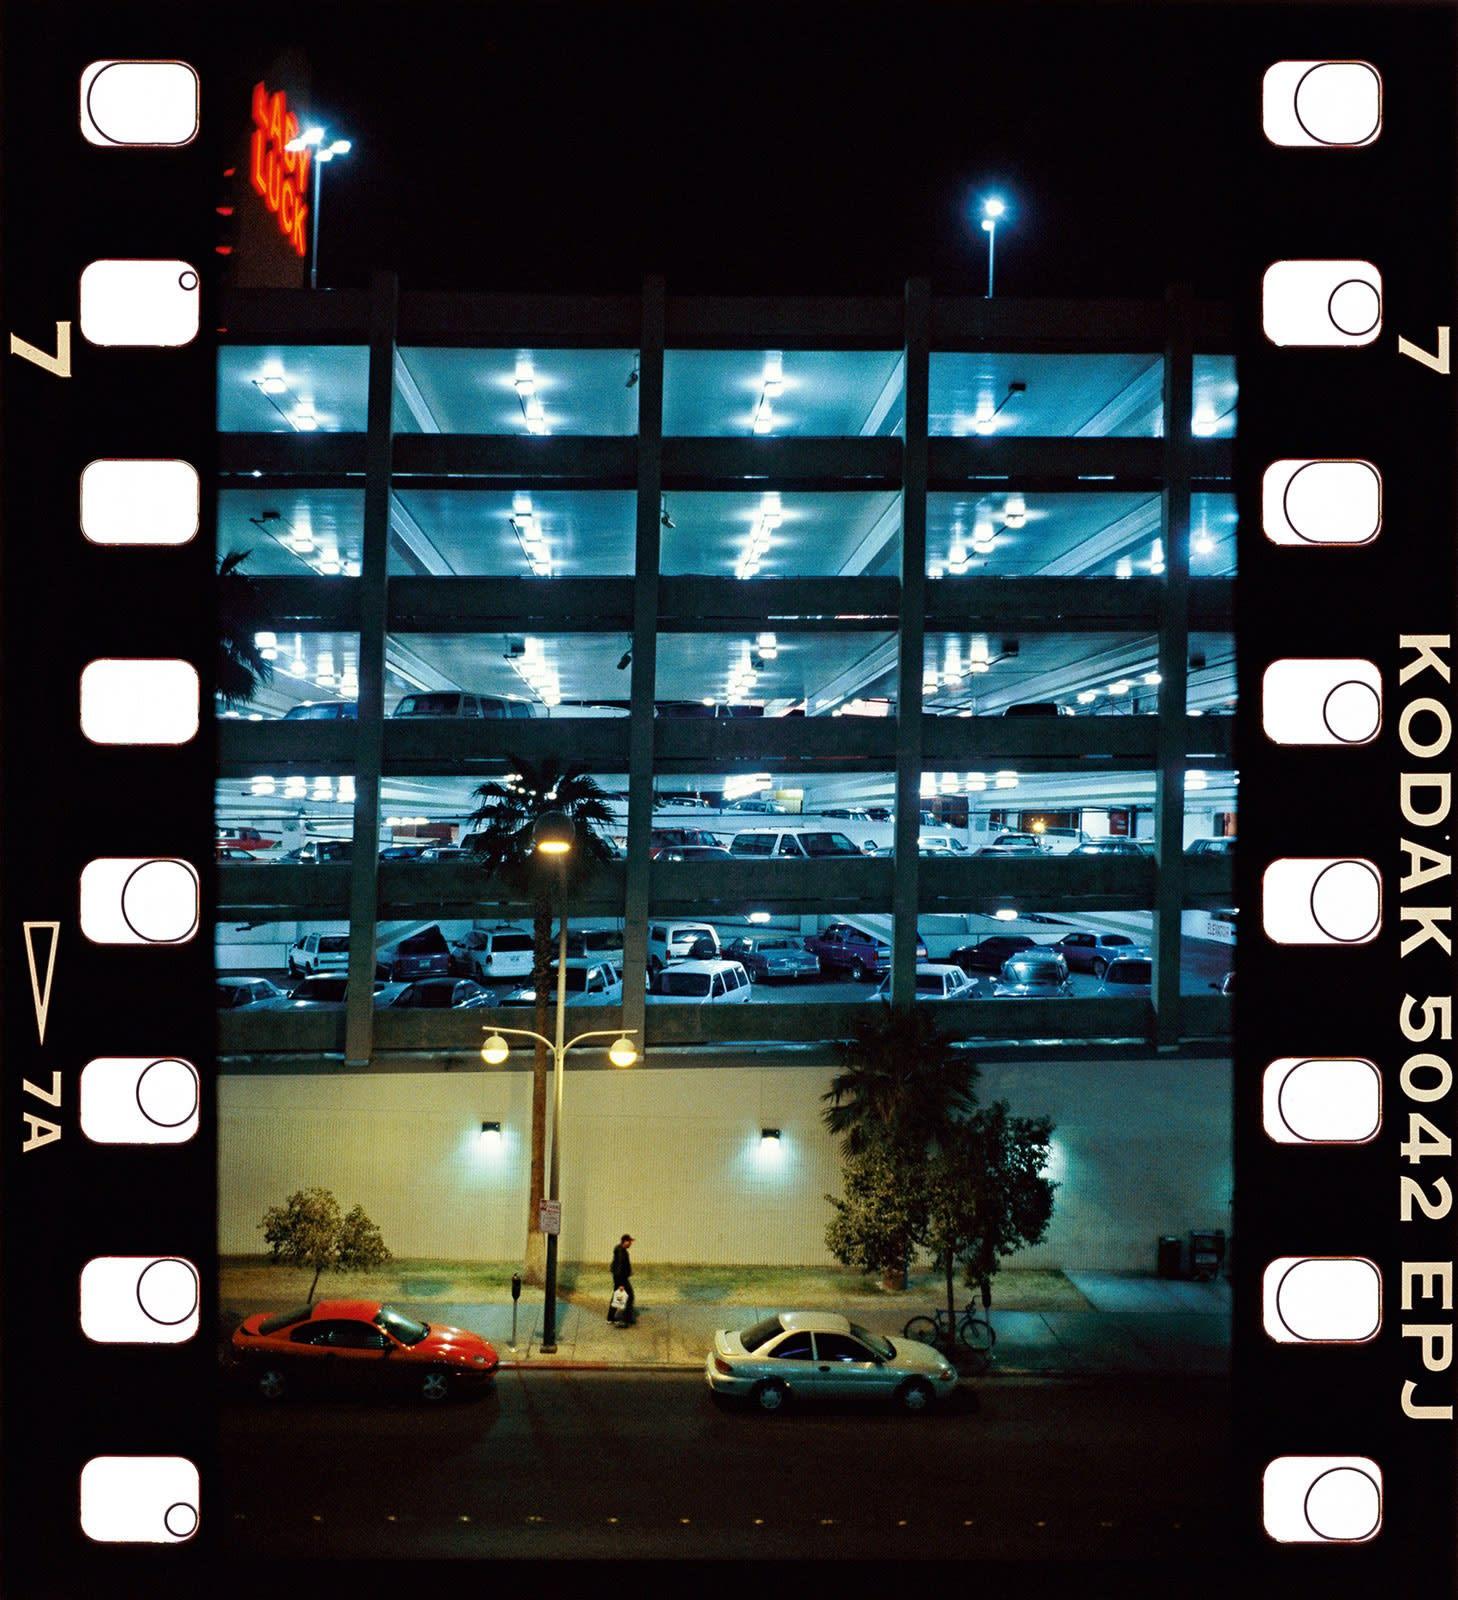 Jean-Christophe Béchet Las Vegas, Nevada Tirage Ilfochrome (Cibachrome) Dim. papier: 40 x 50 cm